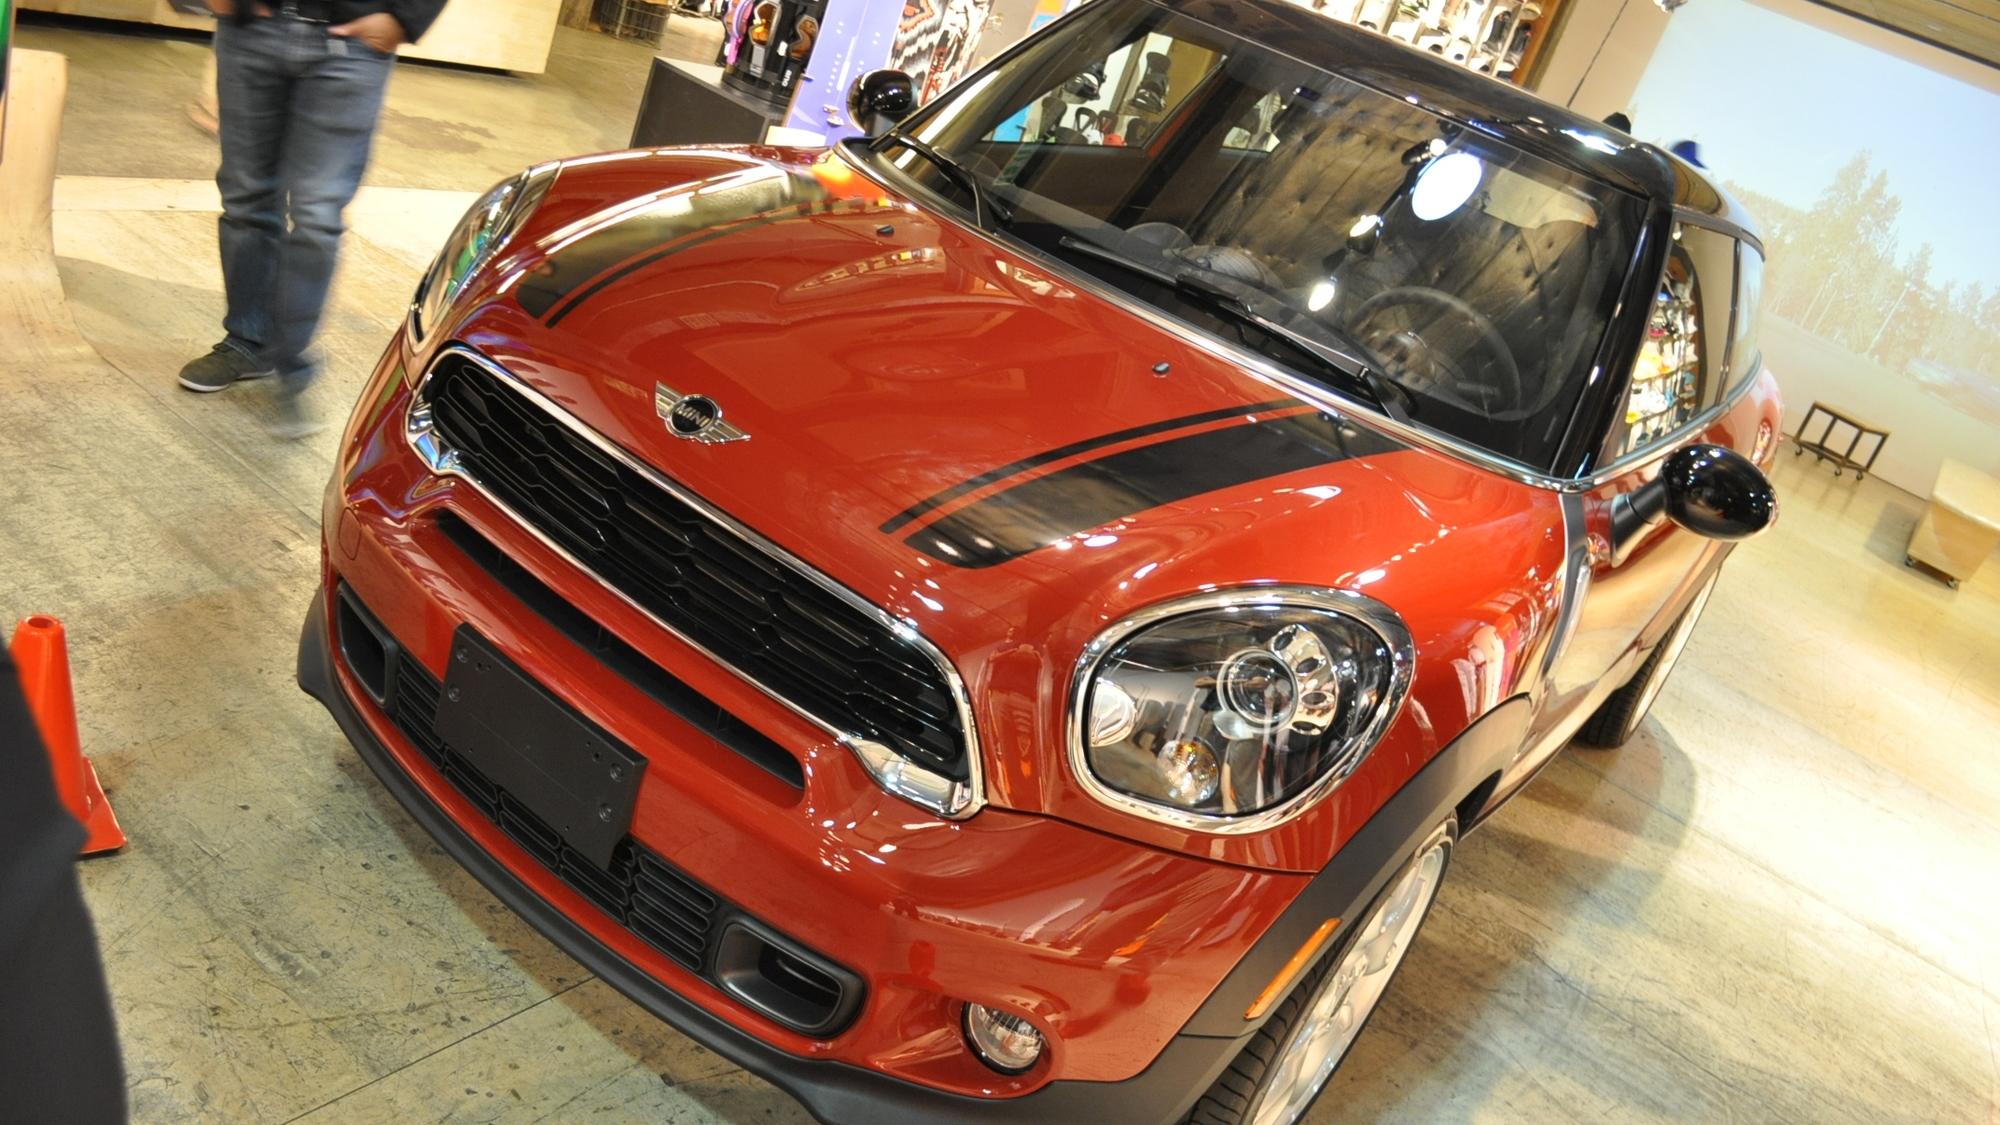 2013 MINI Cooper S Paceman, 2012 LA Auto Show Live Shots